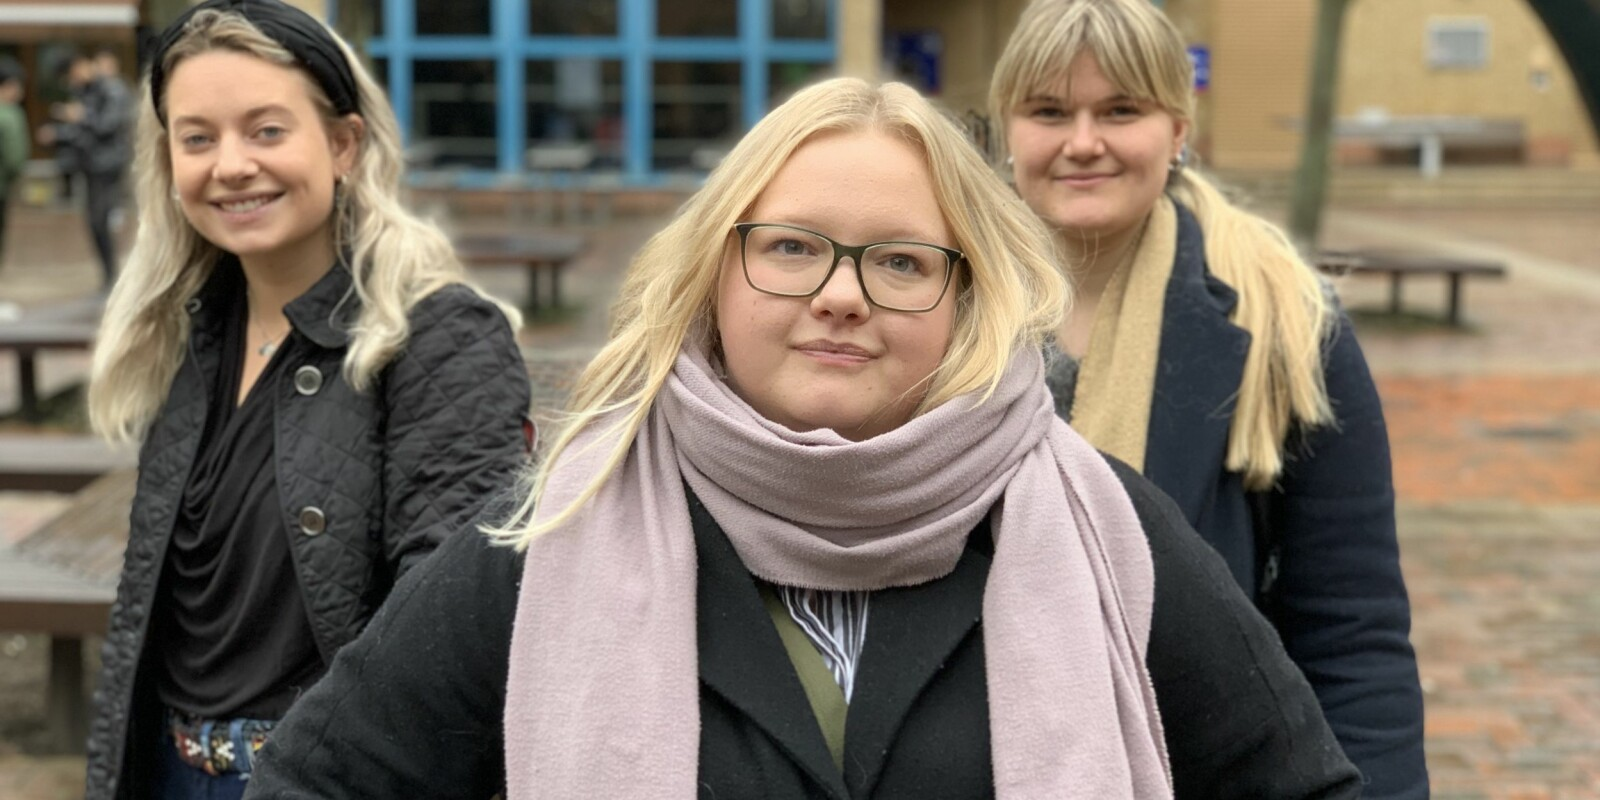 Ellinor Høgberg, Renate Davidsen Klungland og Sara Giovannini kom som studenter til Storbritannia etter brexit-avstemningen.